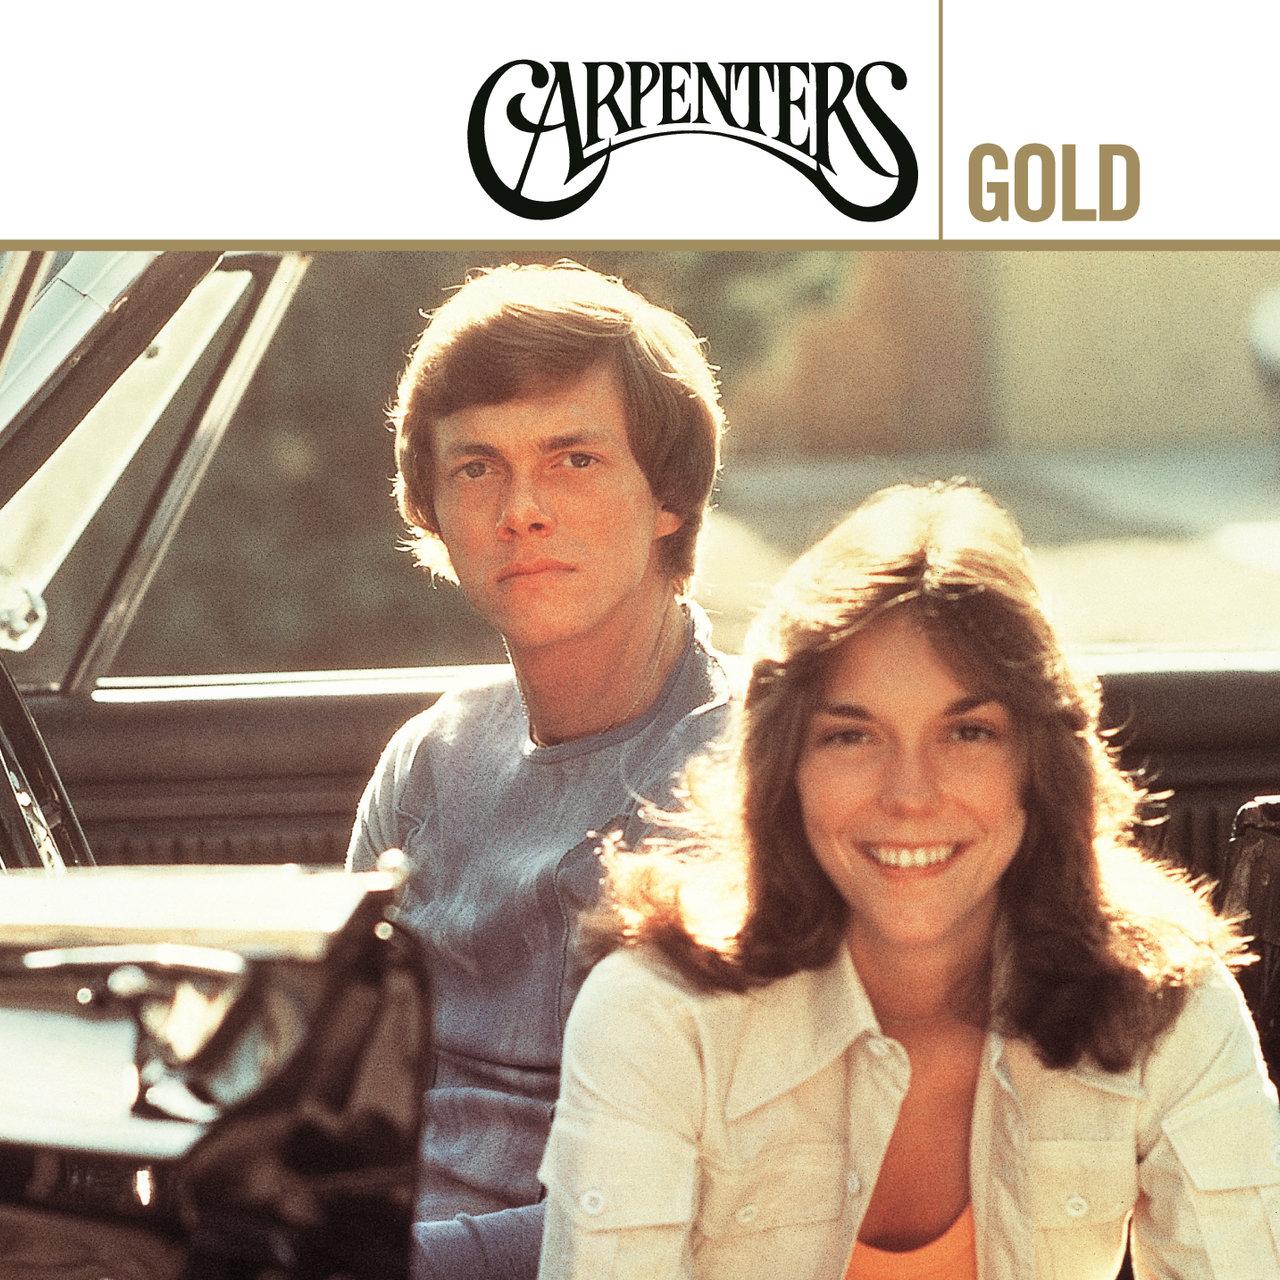 Carpenters Gold - 35th Anniversary Edition / The Carpenters TIDAL